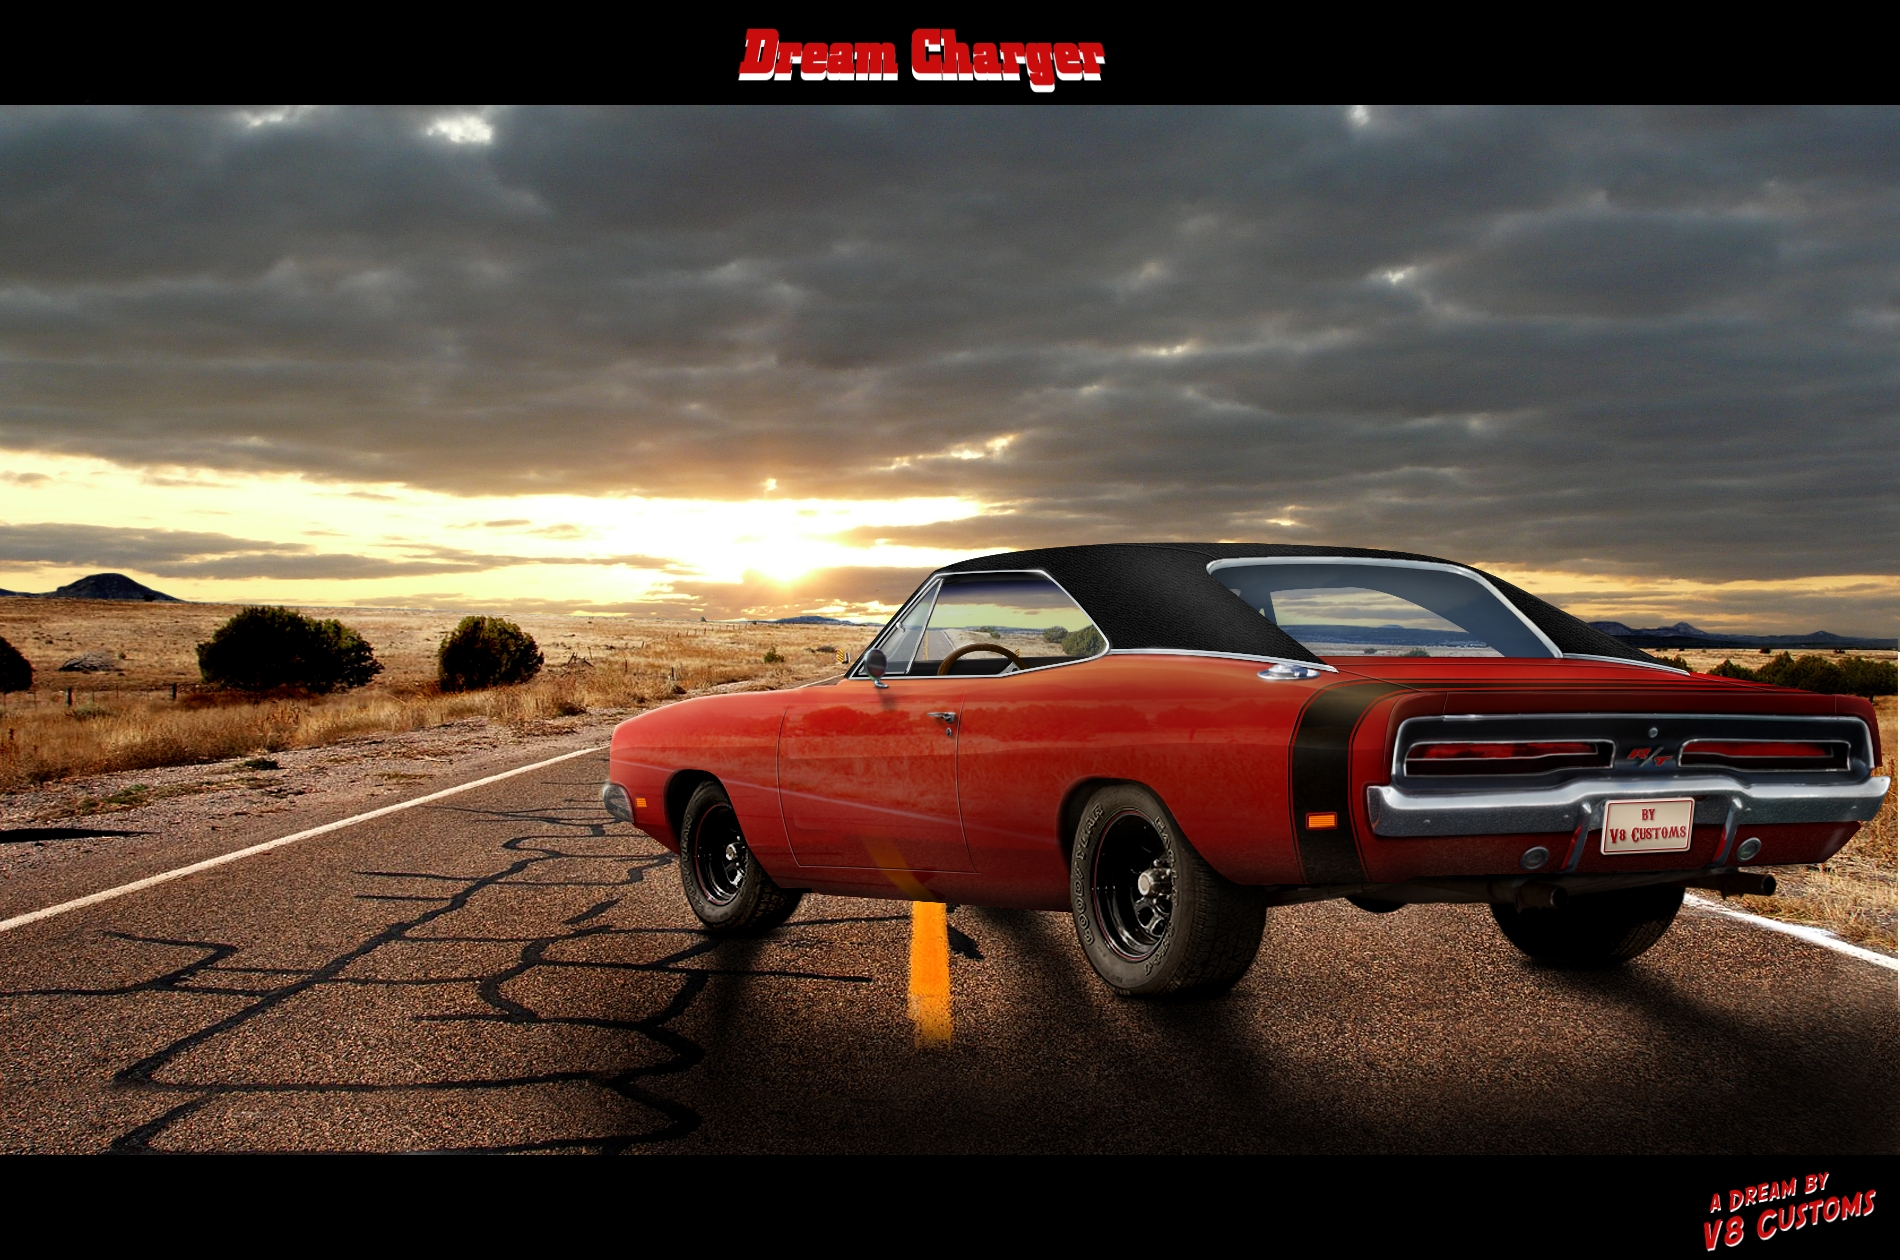 V8 Customs s Profile › Autemo › Automotive Design Studio